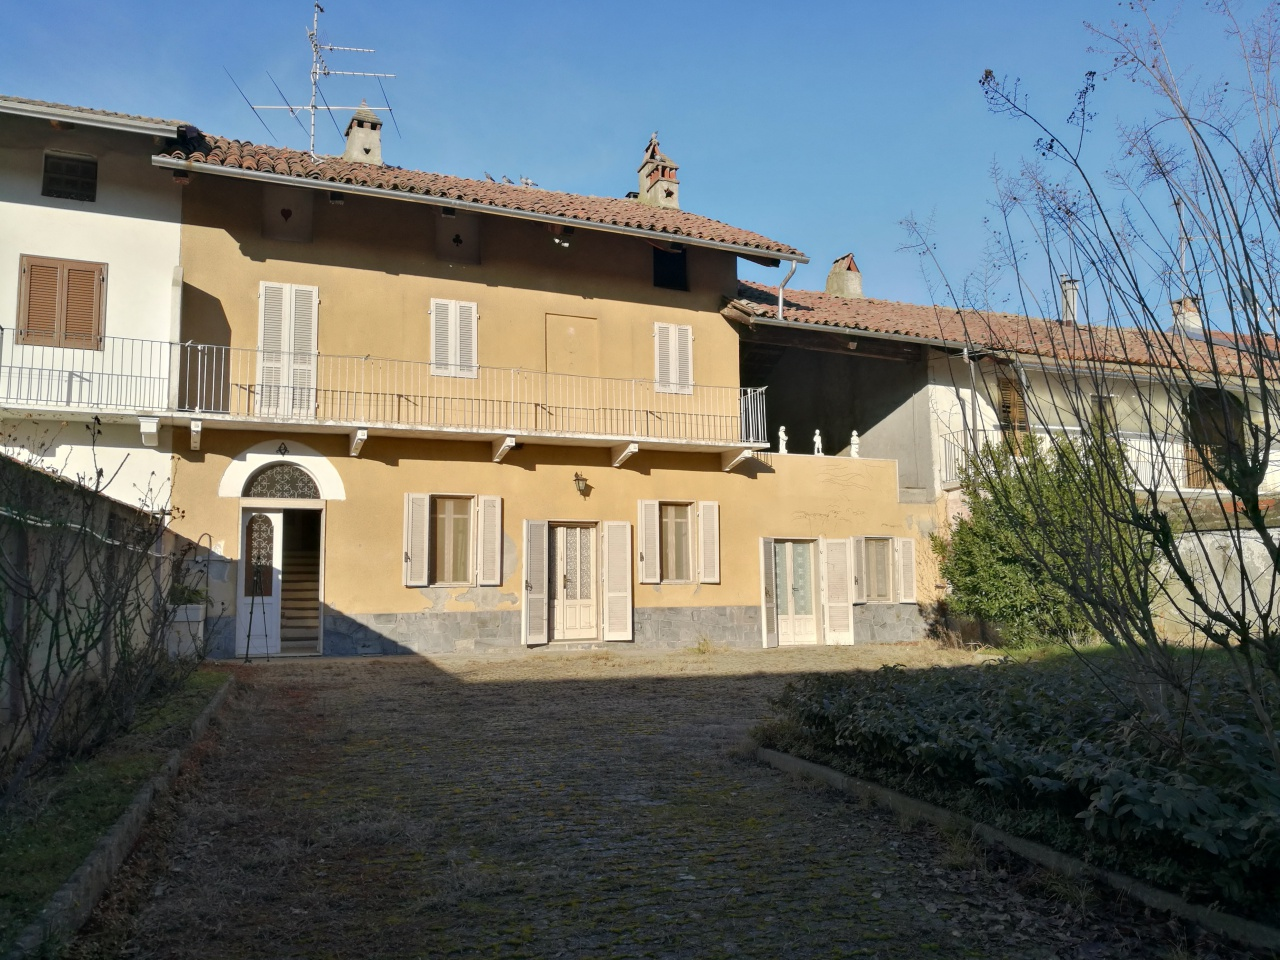 Casa indipendente quadrilocale in vendita a Saluggia (VC)